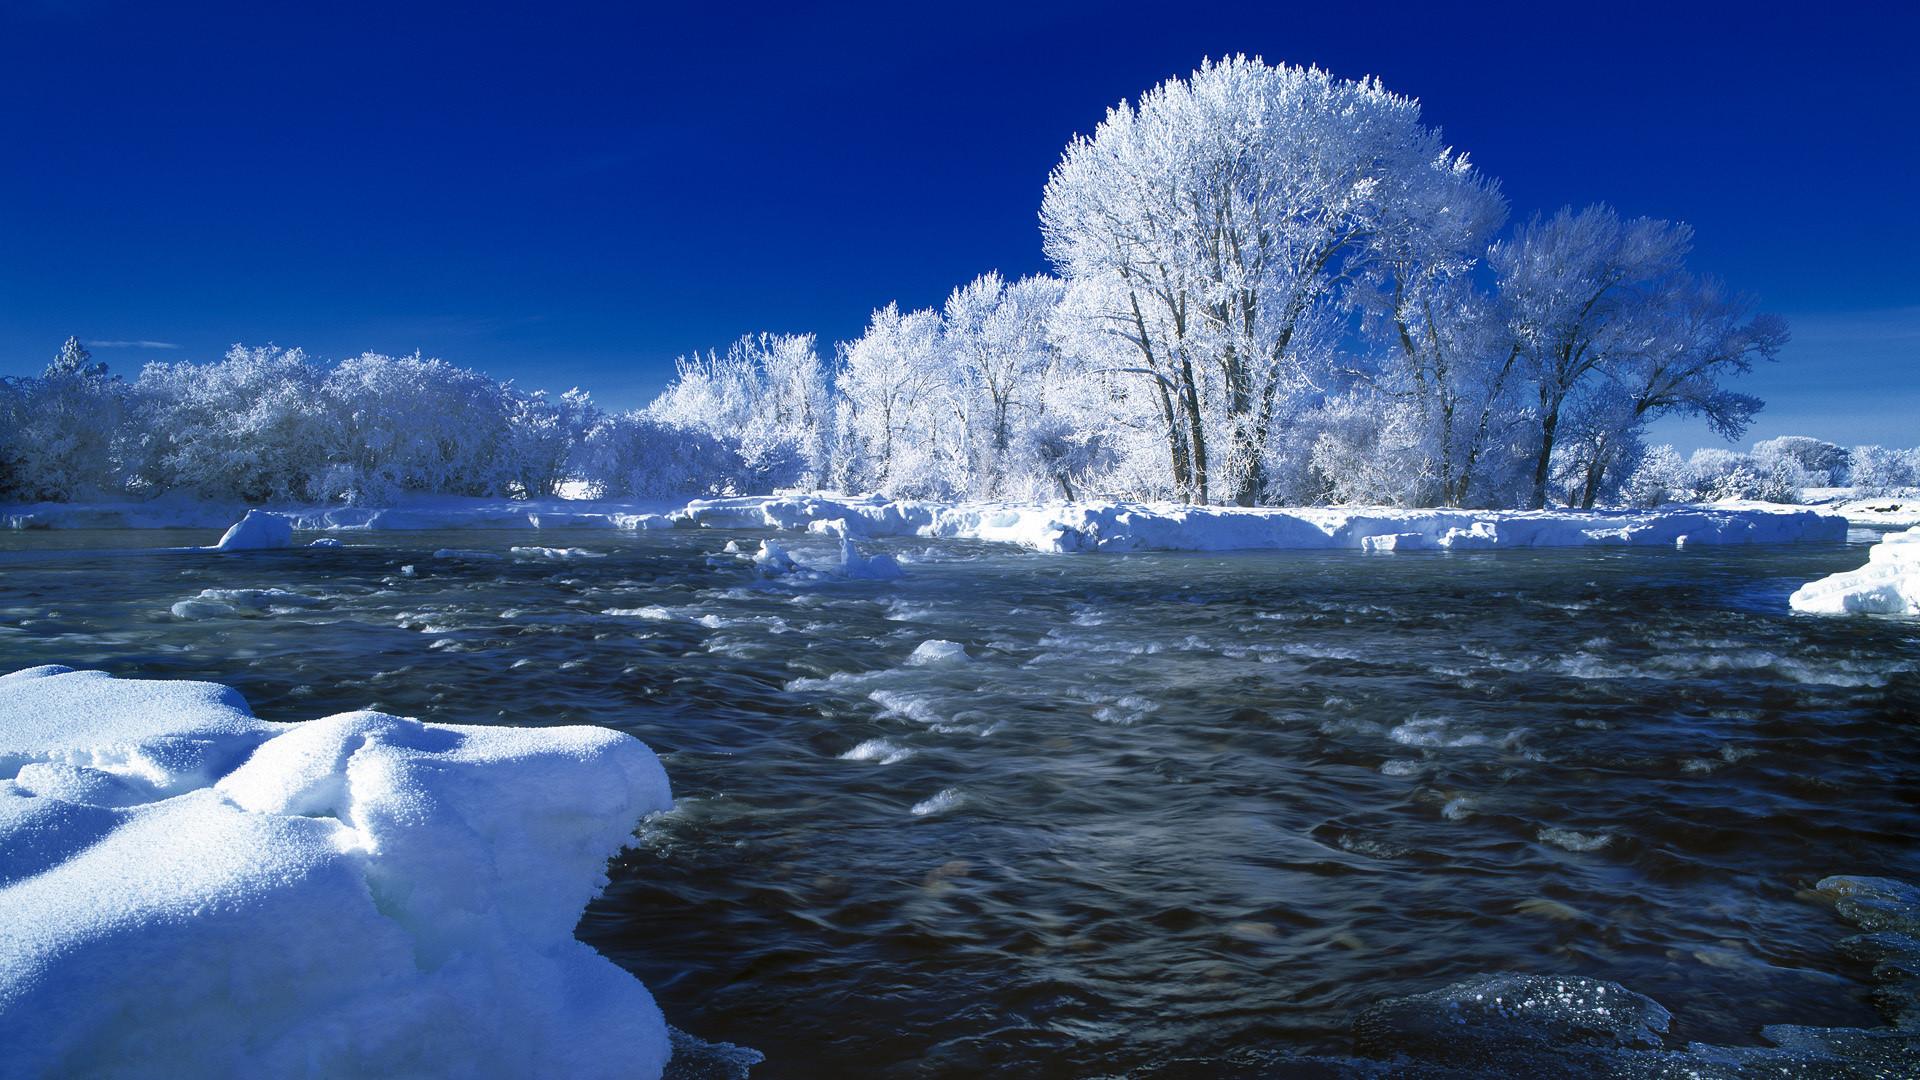 Winter in Idaho